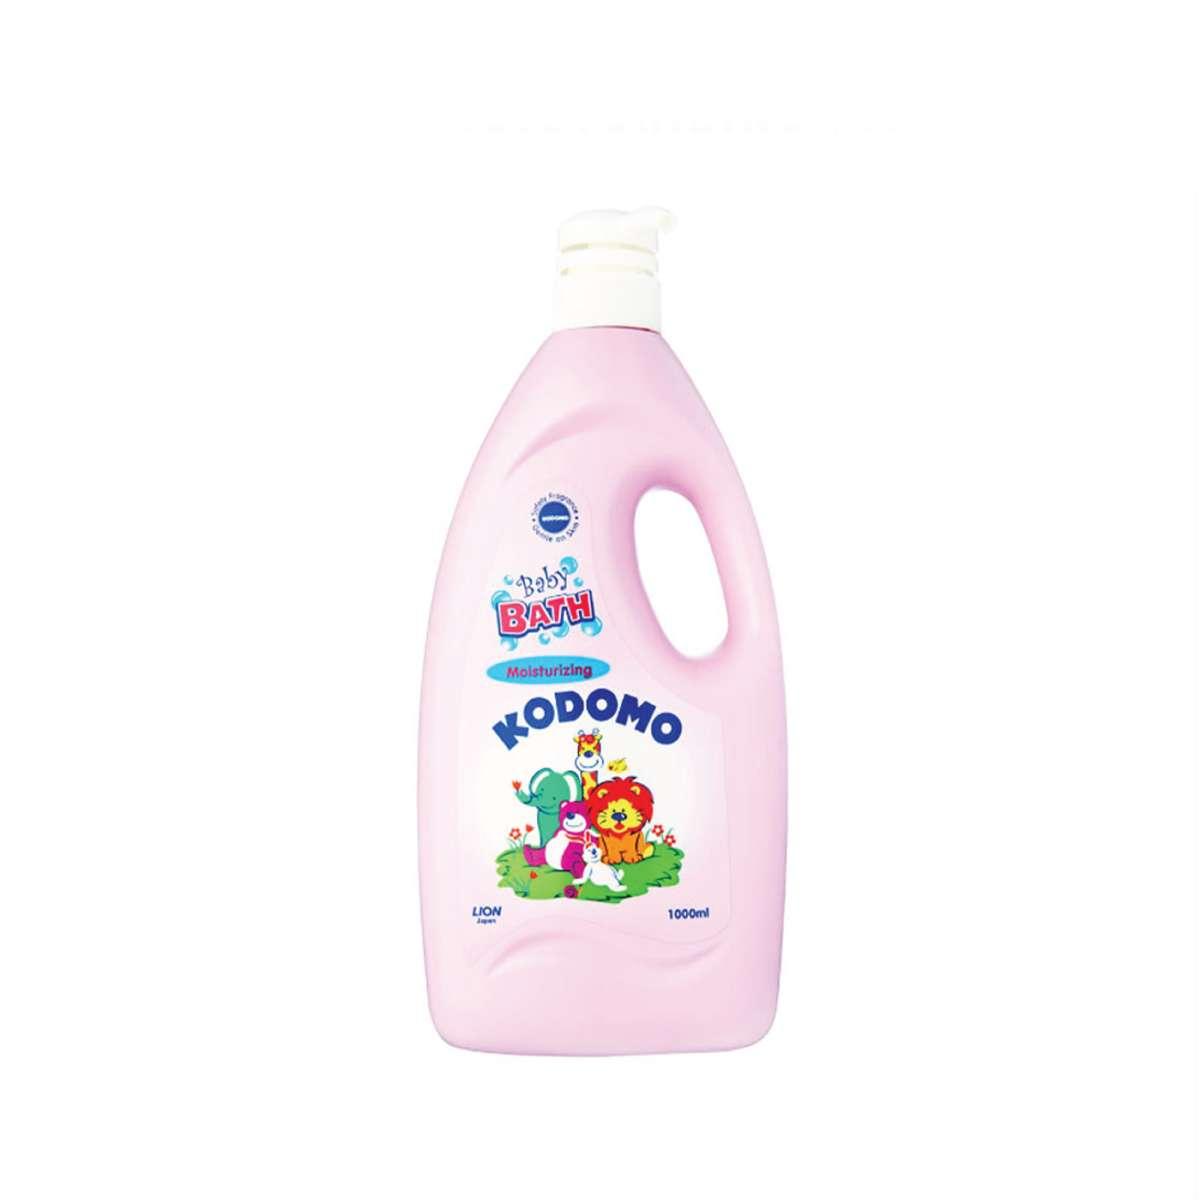 KODOMO Baby Bath Moisturizing 1000 ML